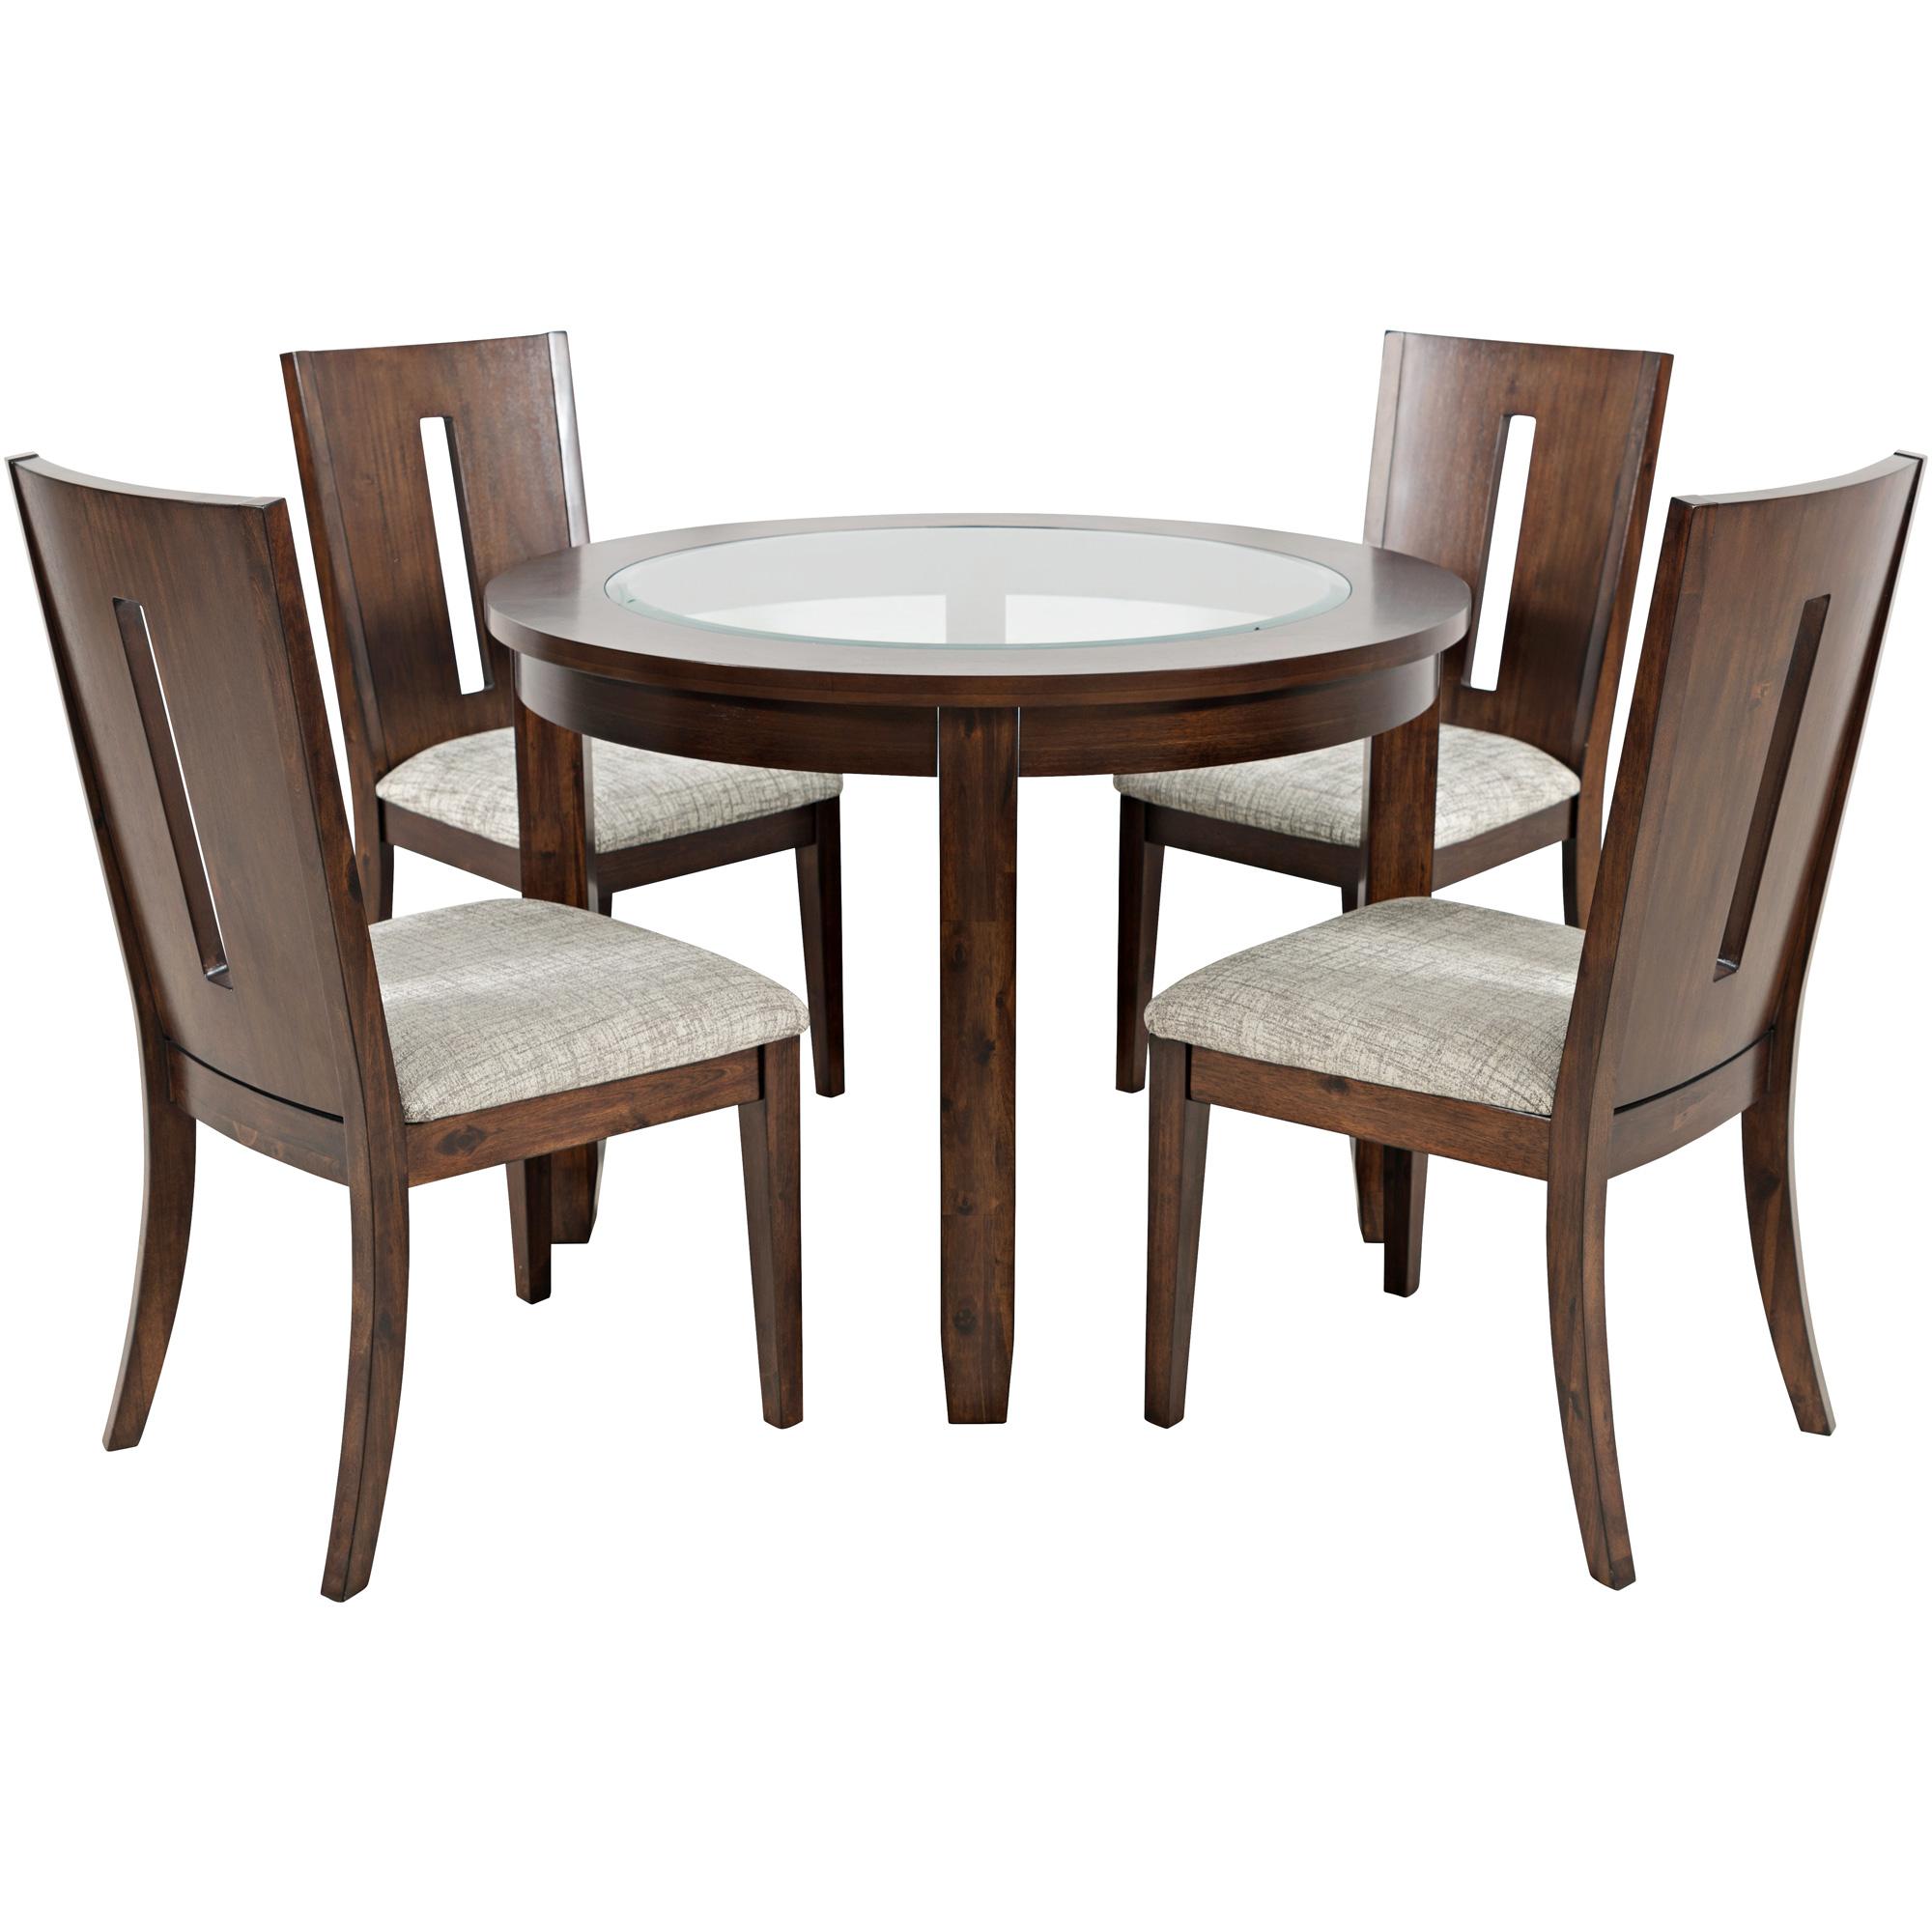 Jofran, Inc. | Urban Icon Merlot Round 5 Piece Dining Set